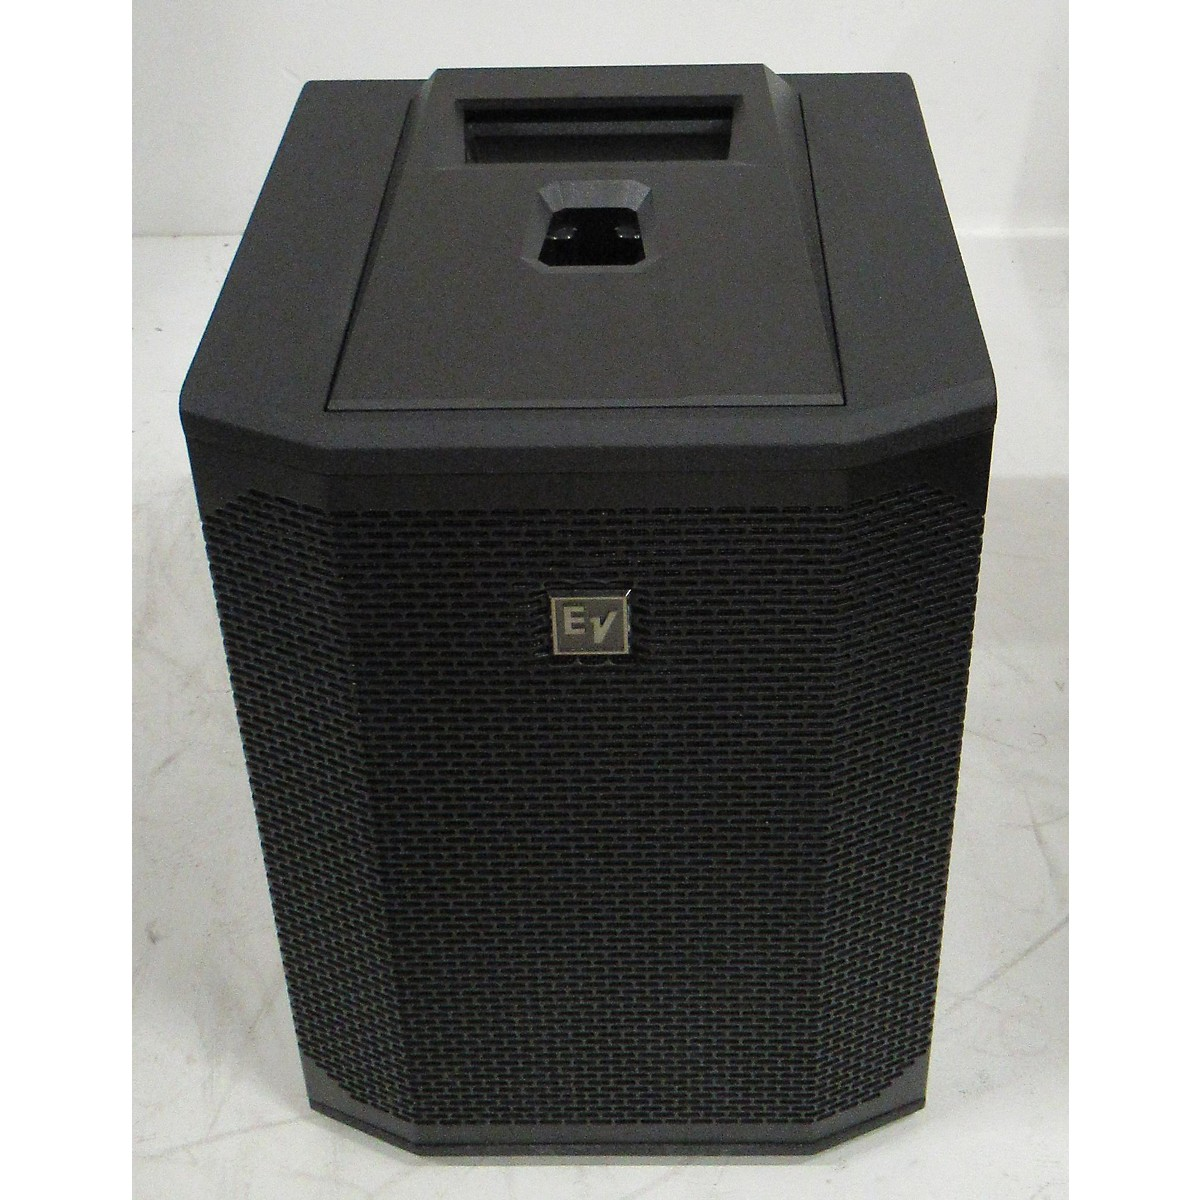 Electro-Voice EV Powered Speaker